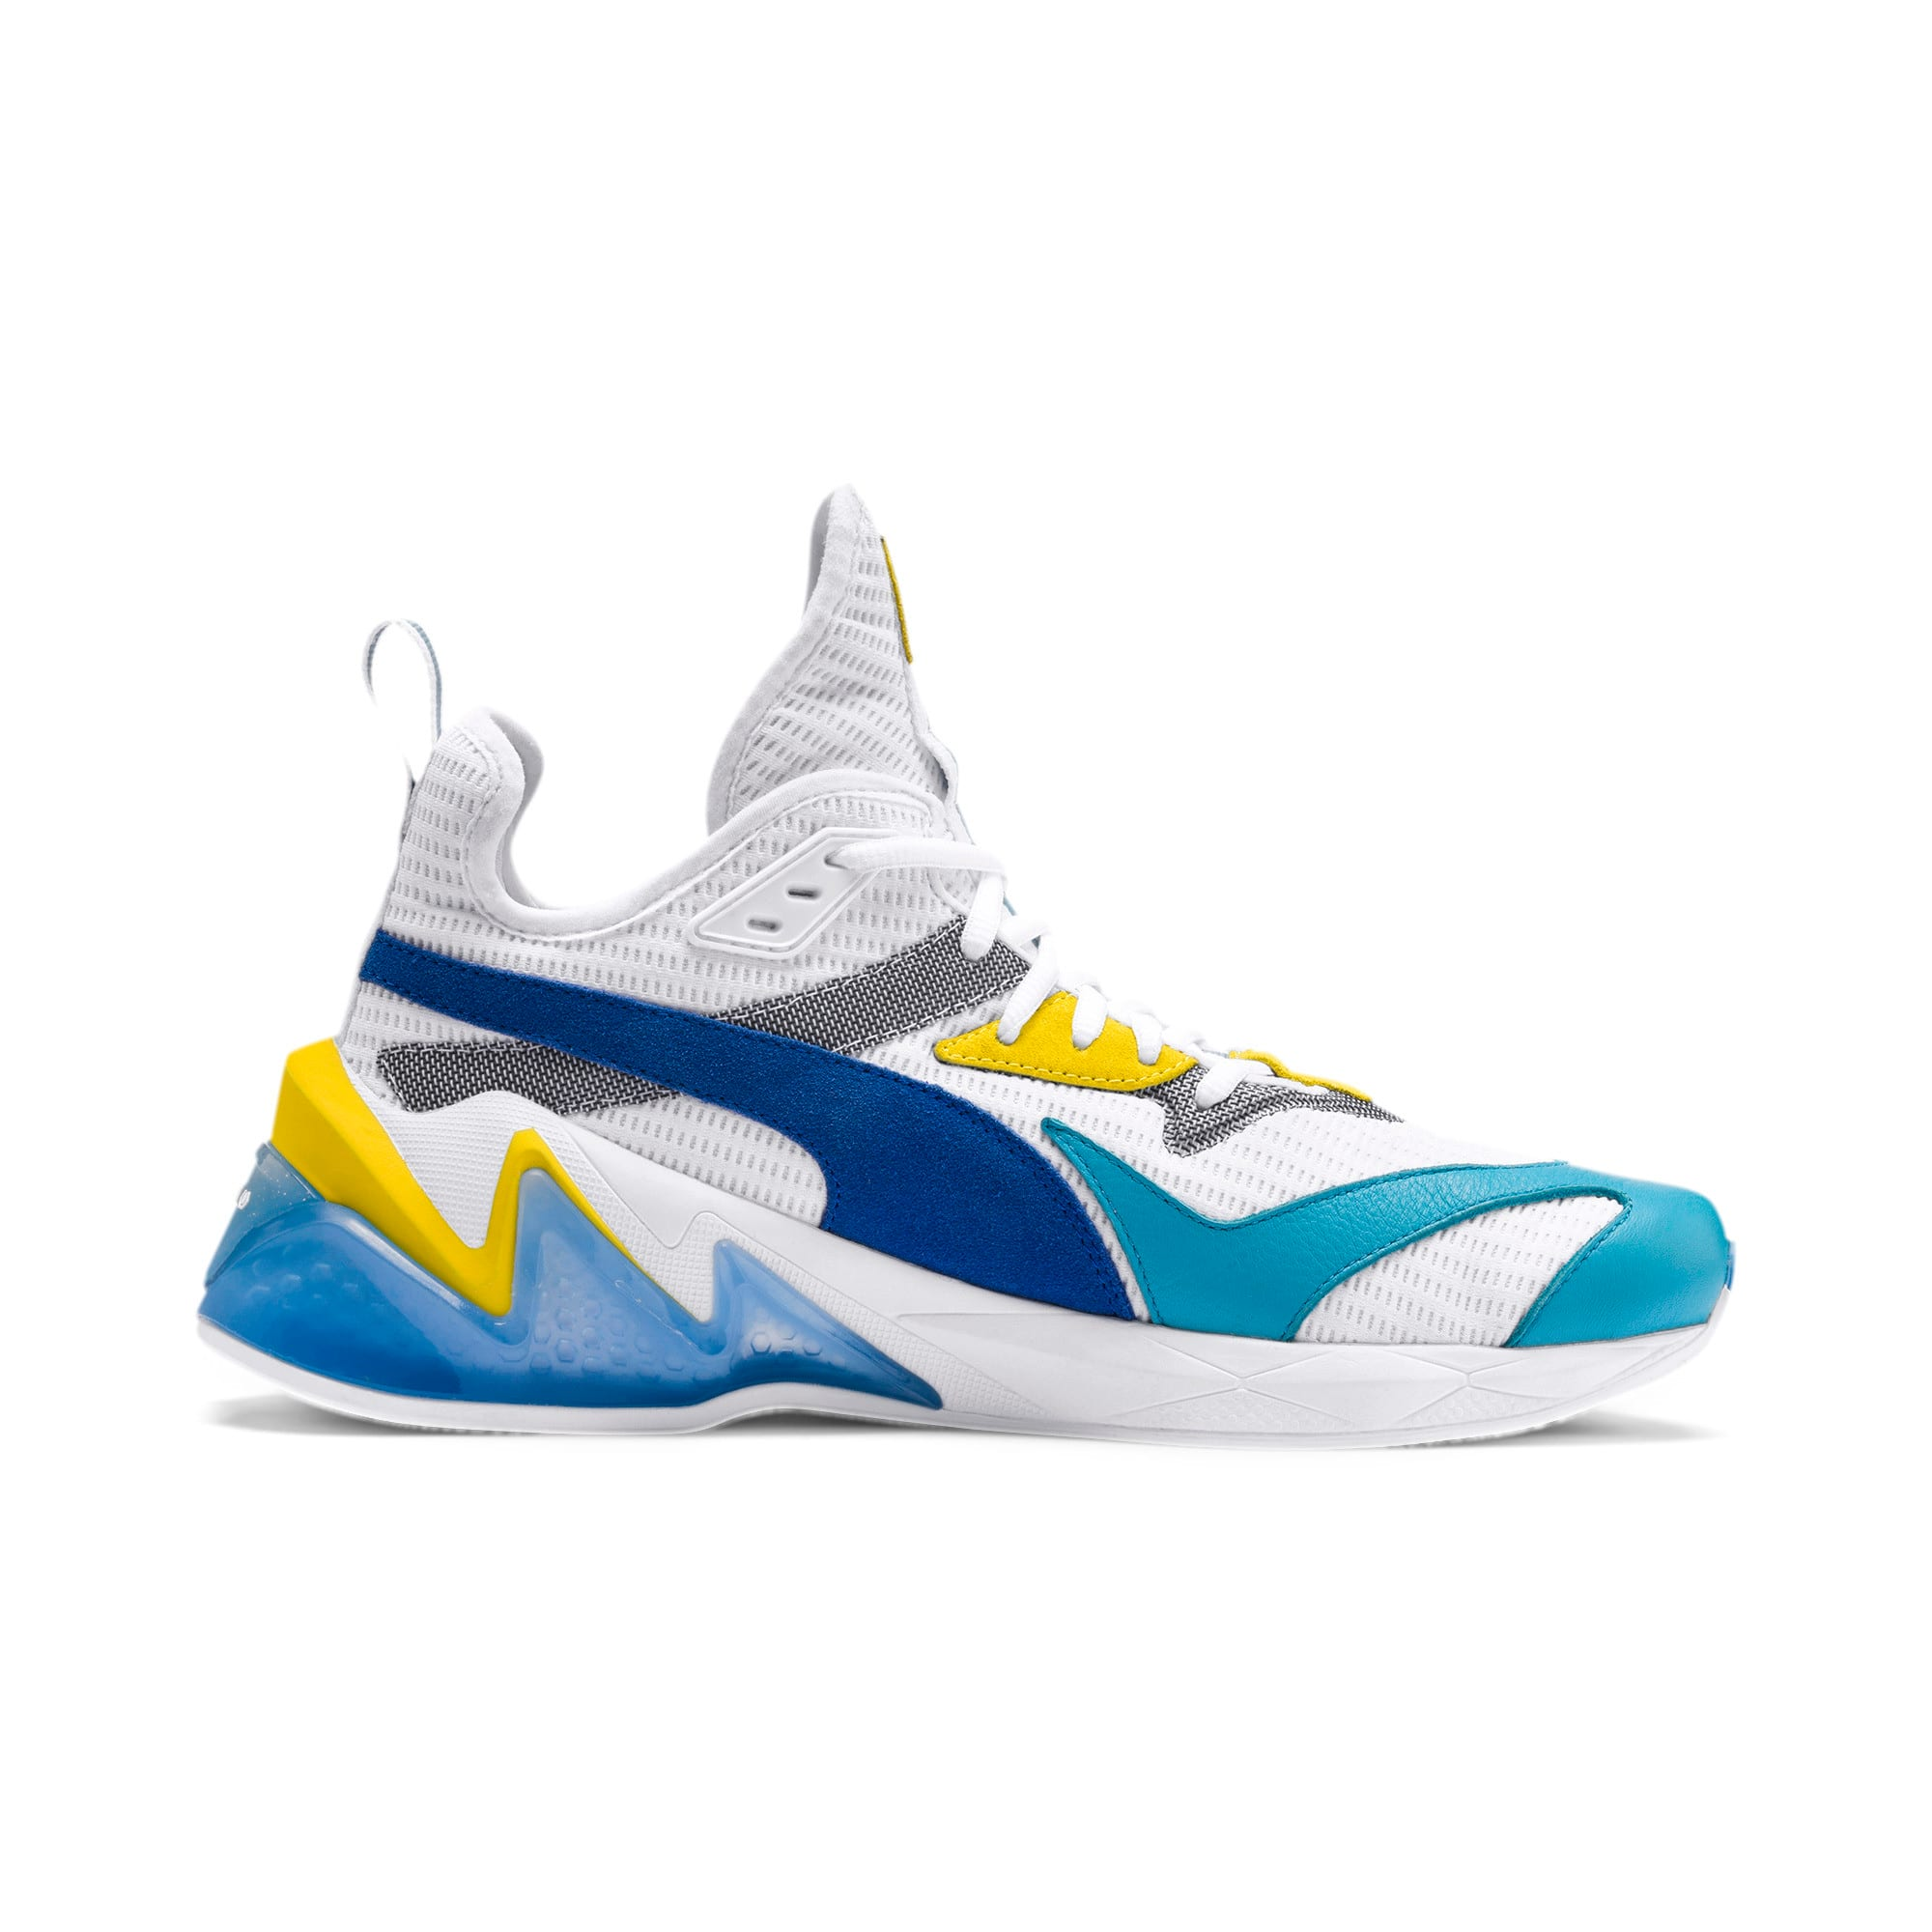 Thumbnail 5 of LQDCELL Origin Men's Training Shoes, Puma White-B Blue-Blz Yellow, medium